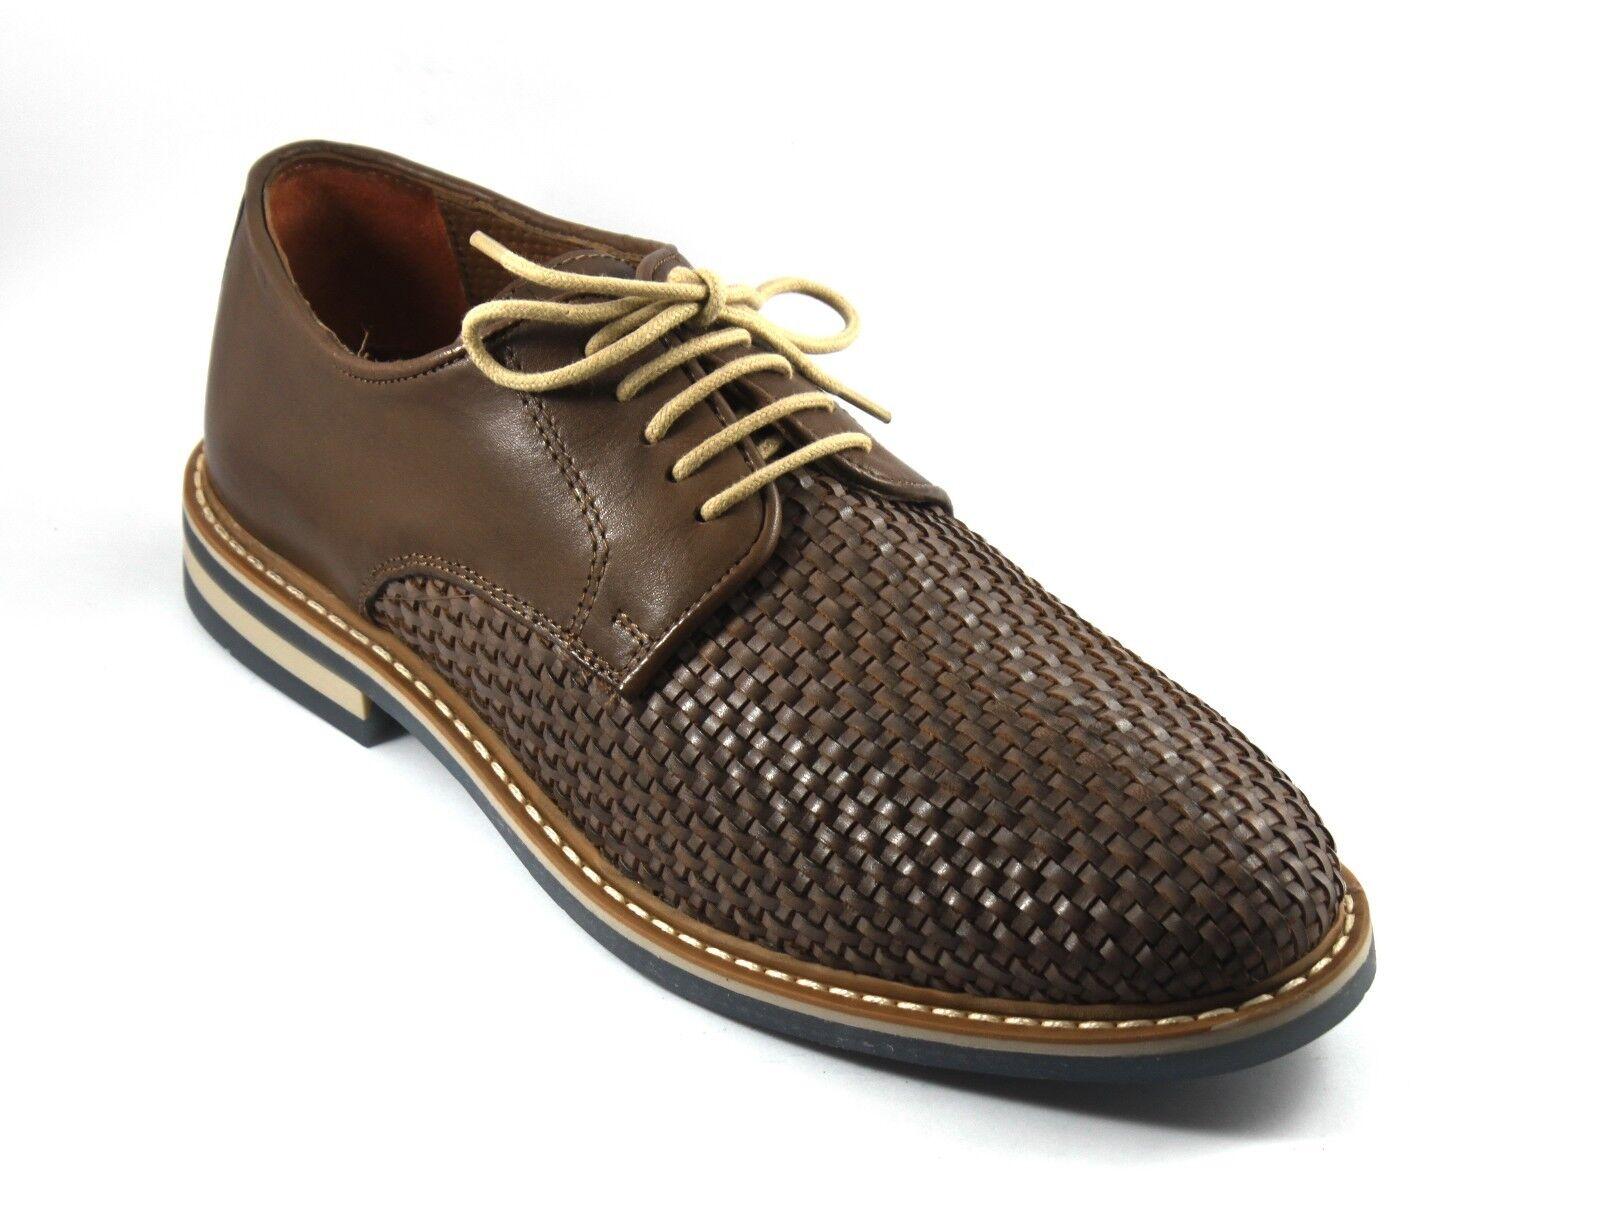 Zapatos Zapatos Zapatos hombre CASUAL IN PELLE MARRONE INTRECCIATA ALLACCIATE 99b7ce